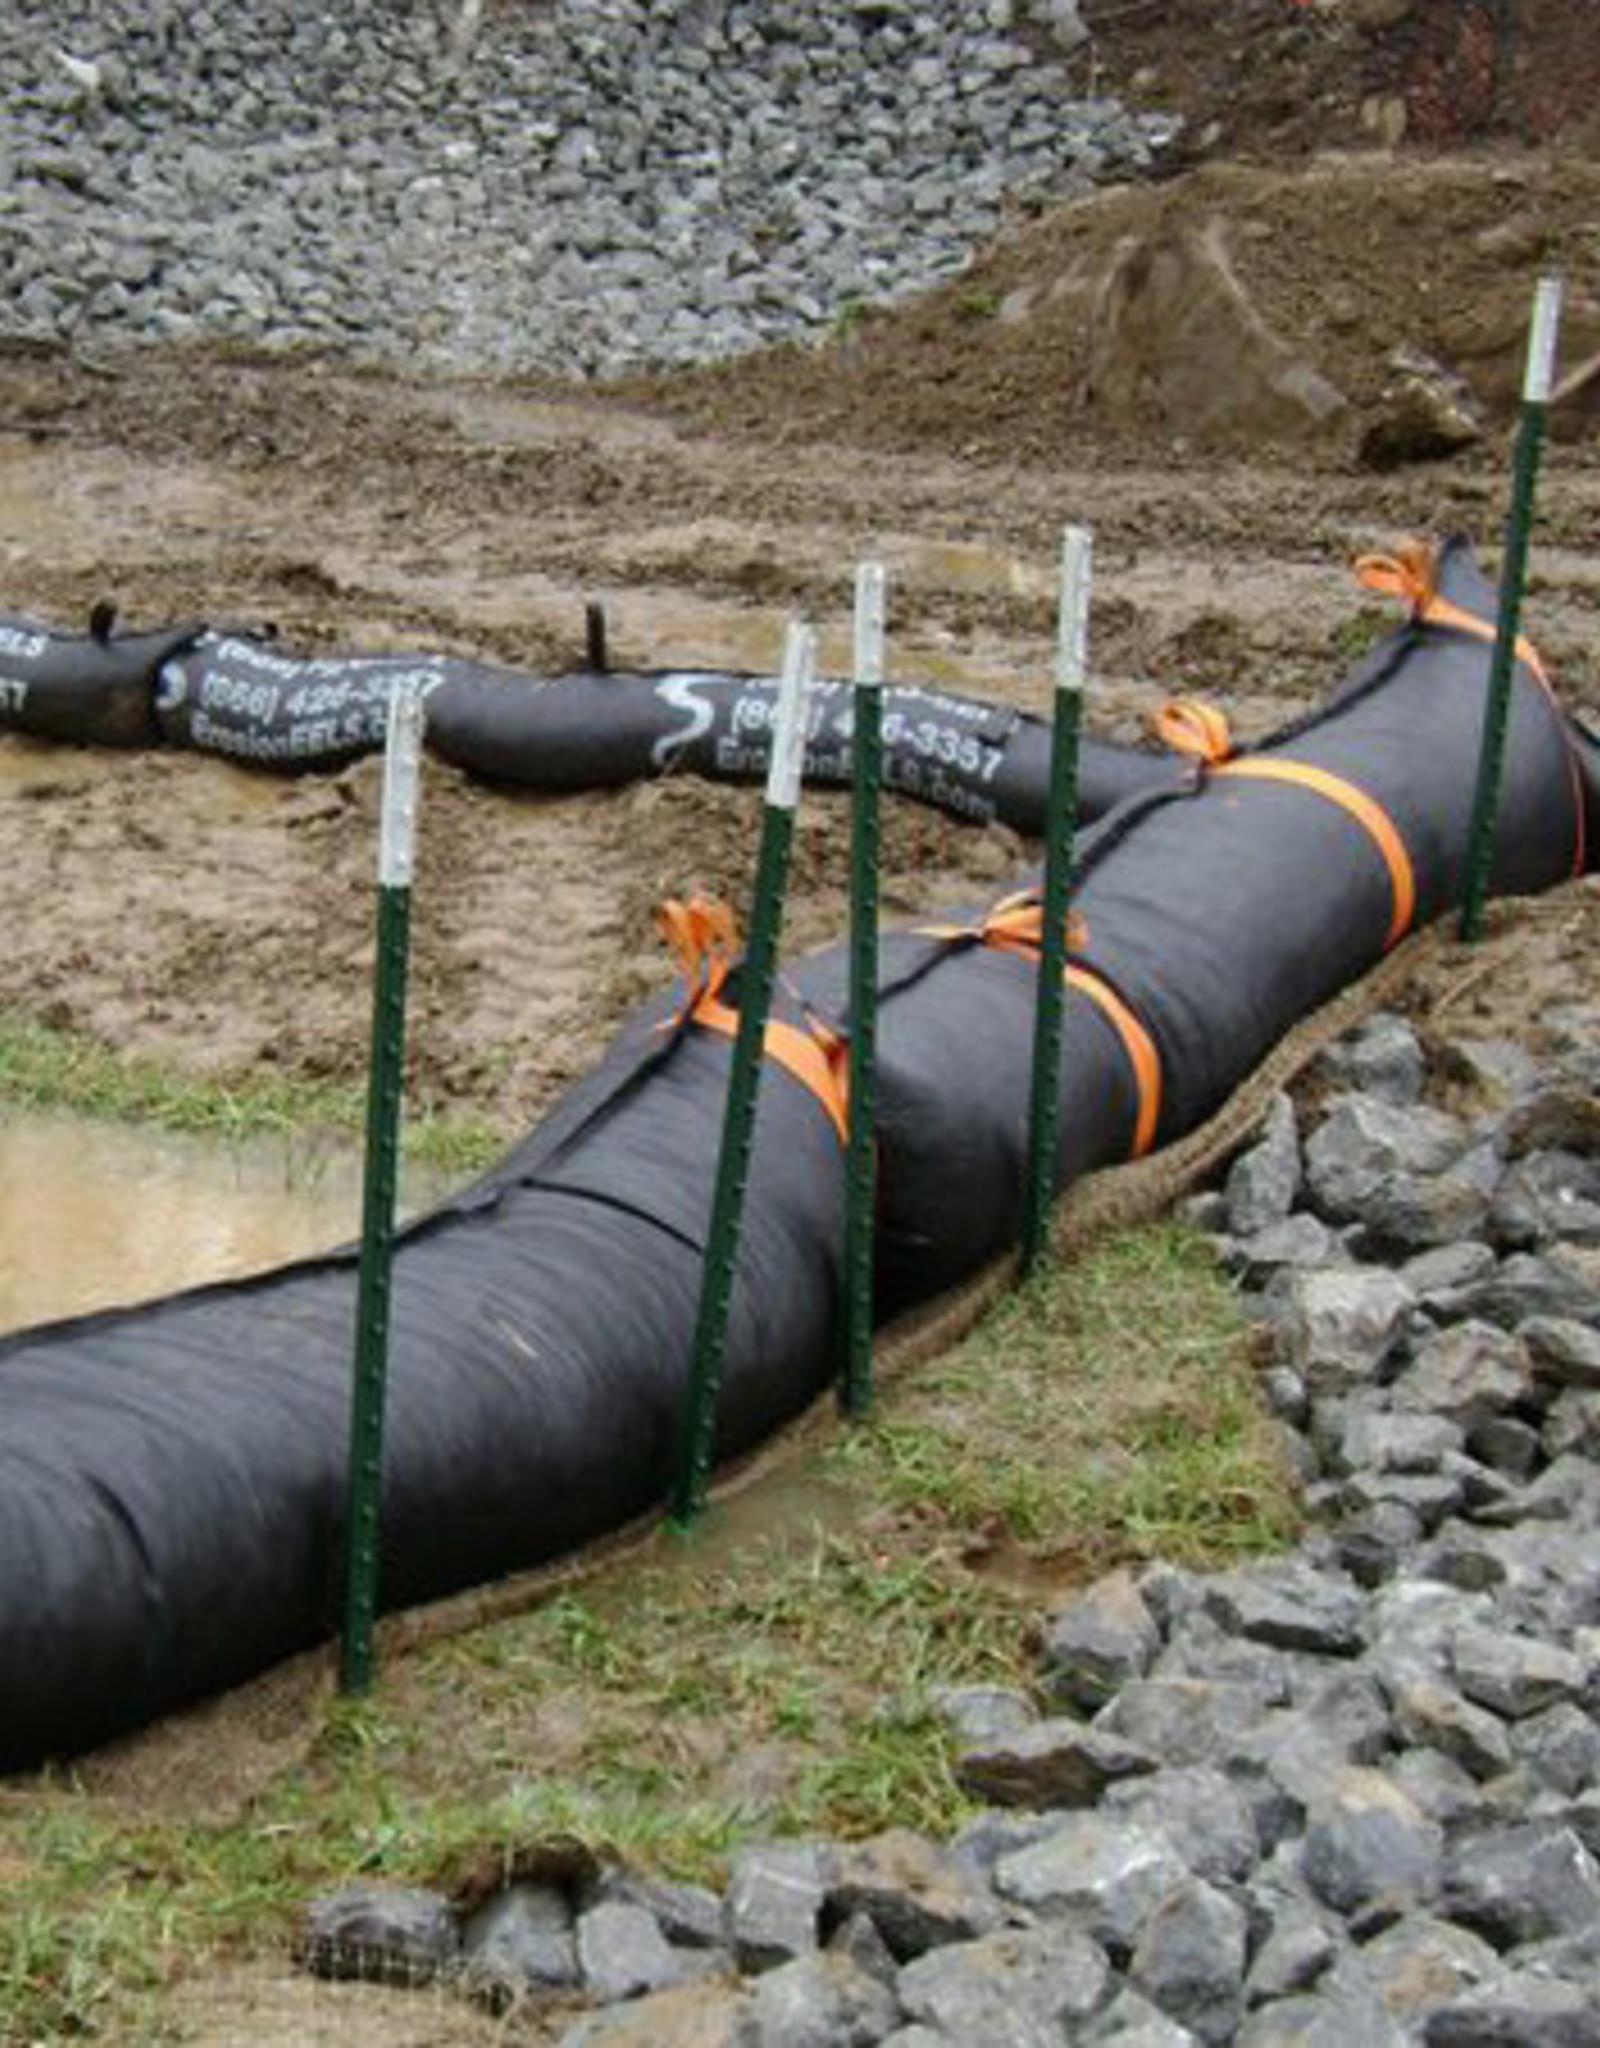 Erosion Eel Low Impact Erosion & Sediment Control Device